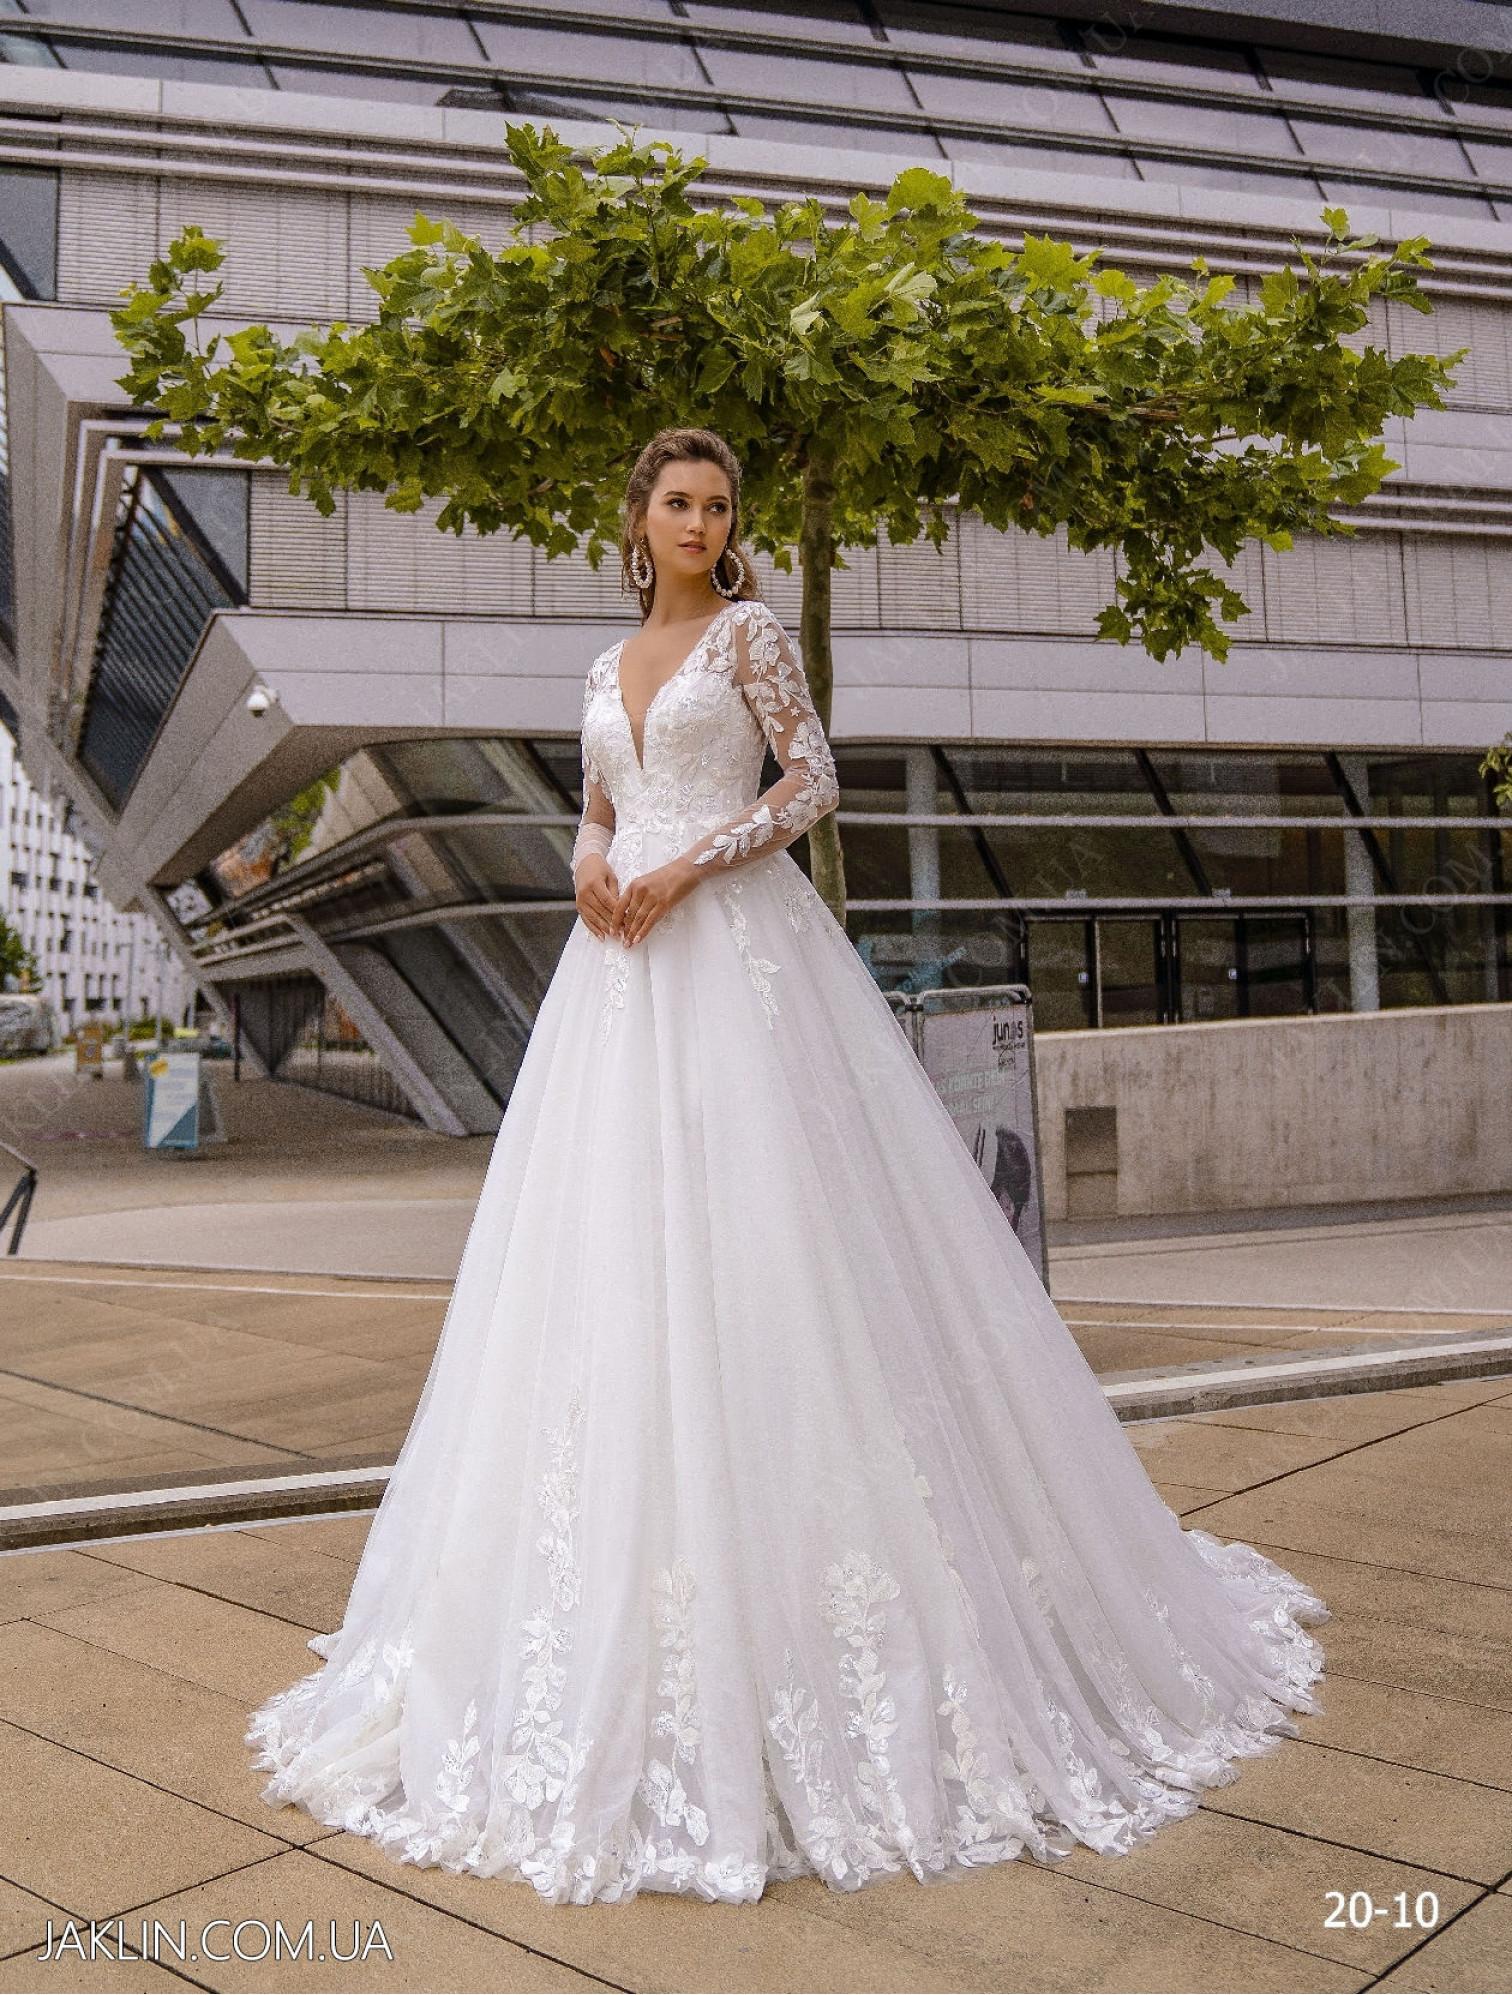 Wedding dress 20-10